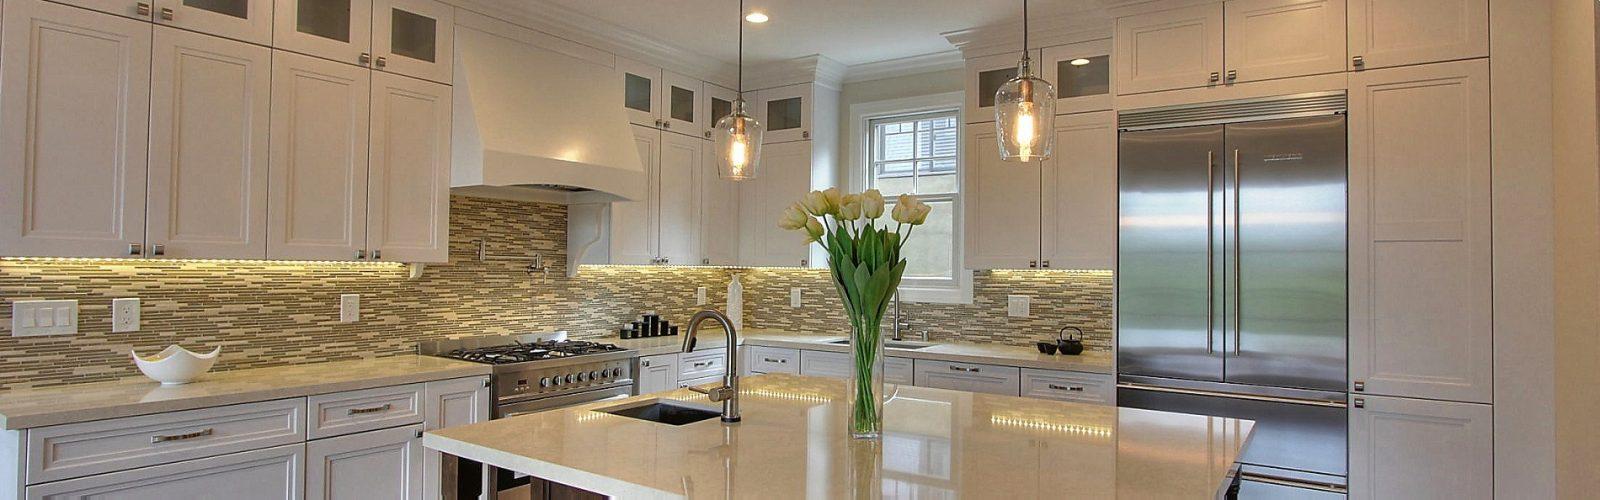 Kitchen Remodel Design Studio | Cabinets U0026 Beyond